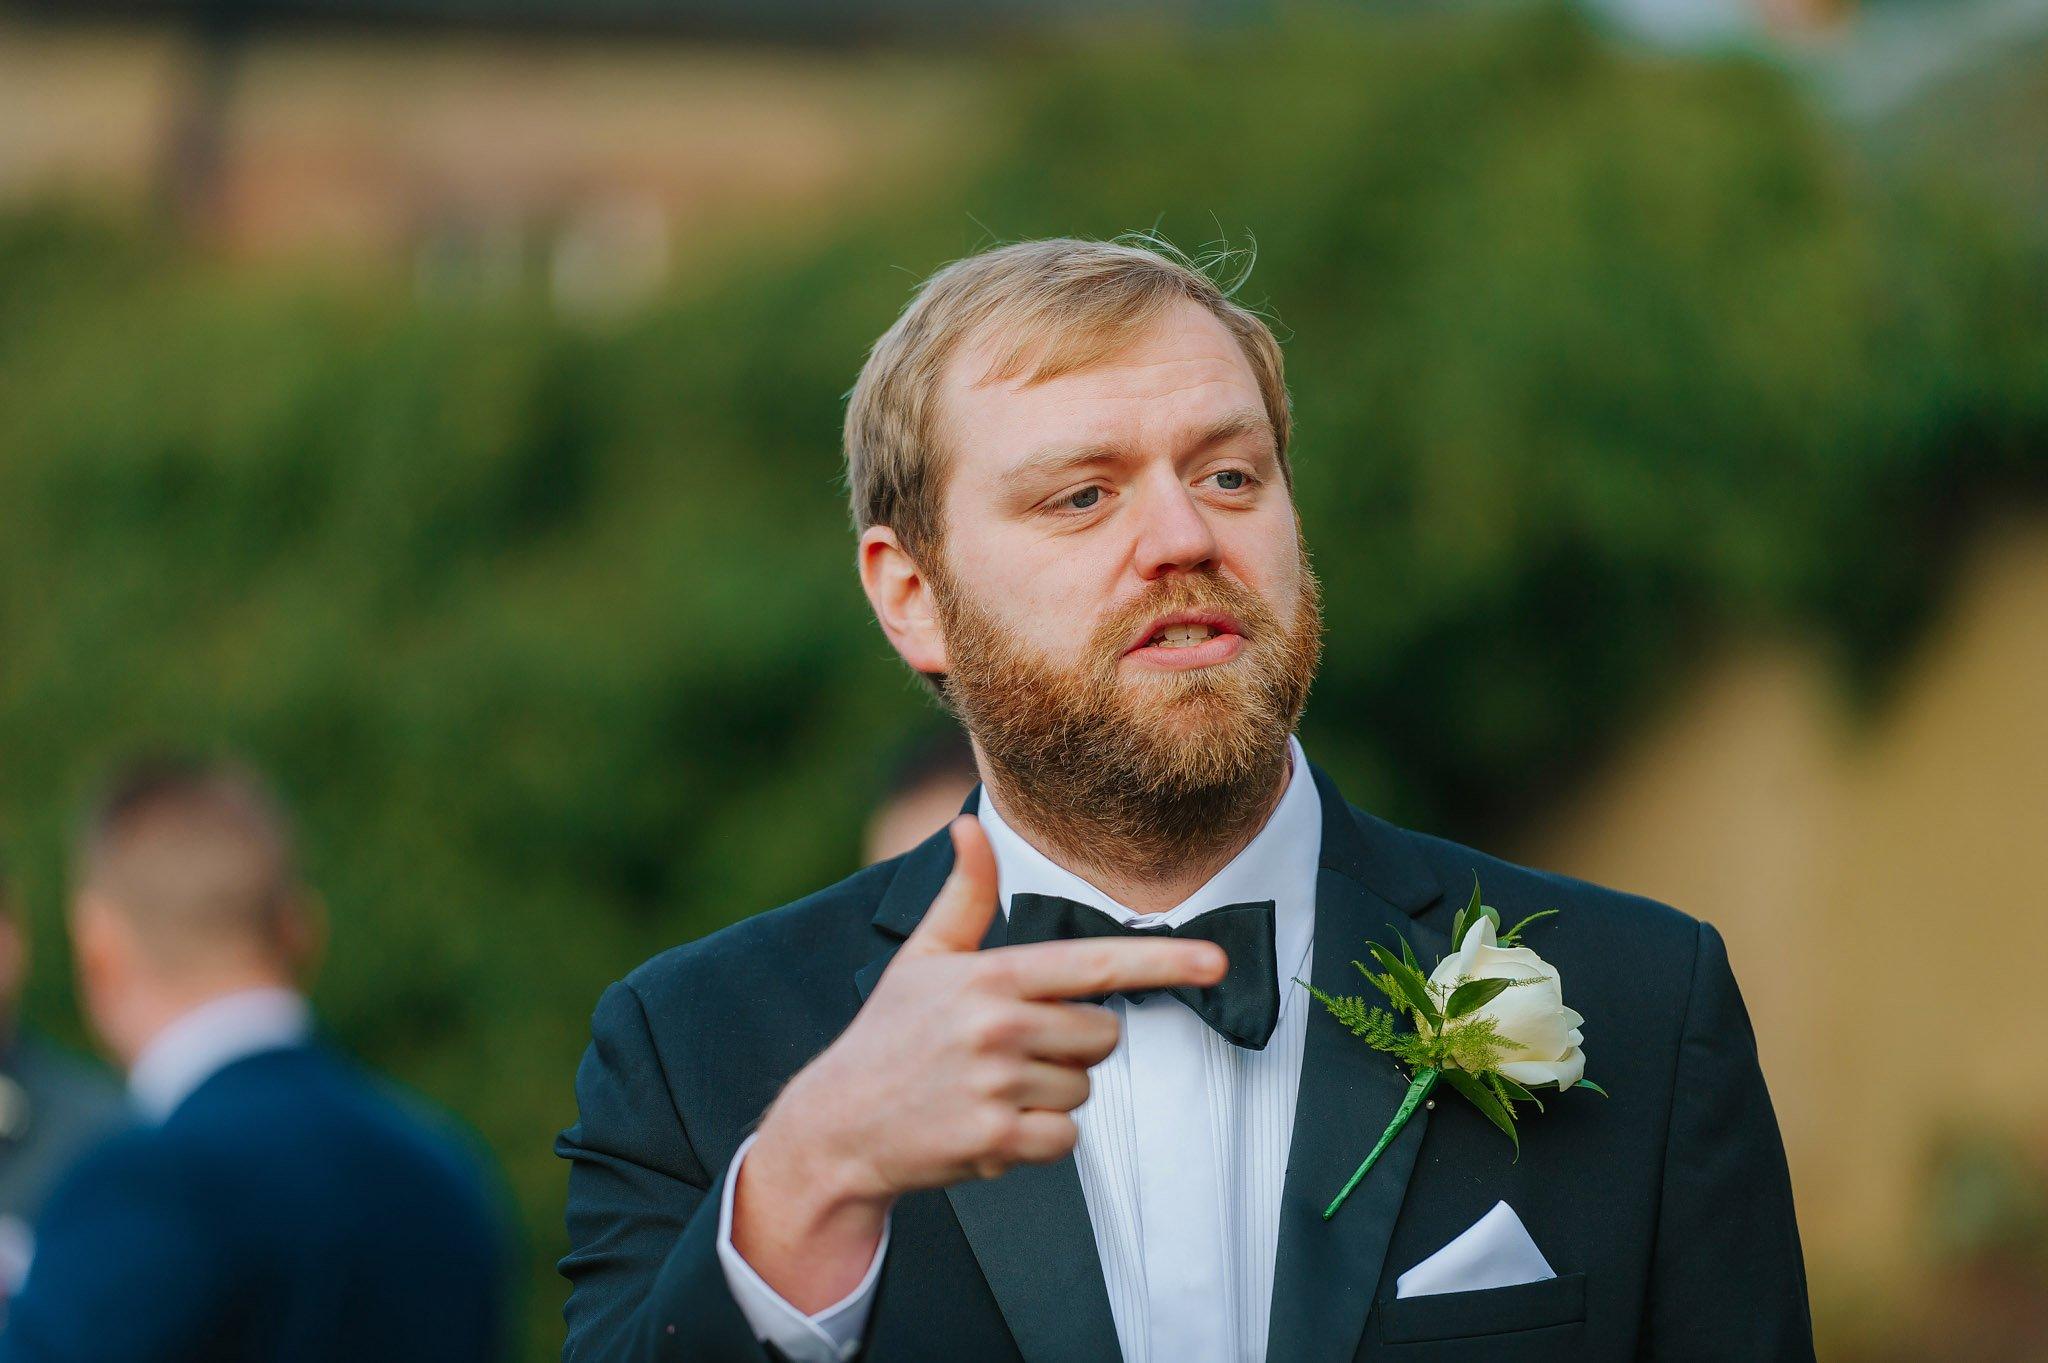 Coombe Abbey wedding in Coventry, Warwickshire - Sam + Matt 34